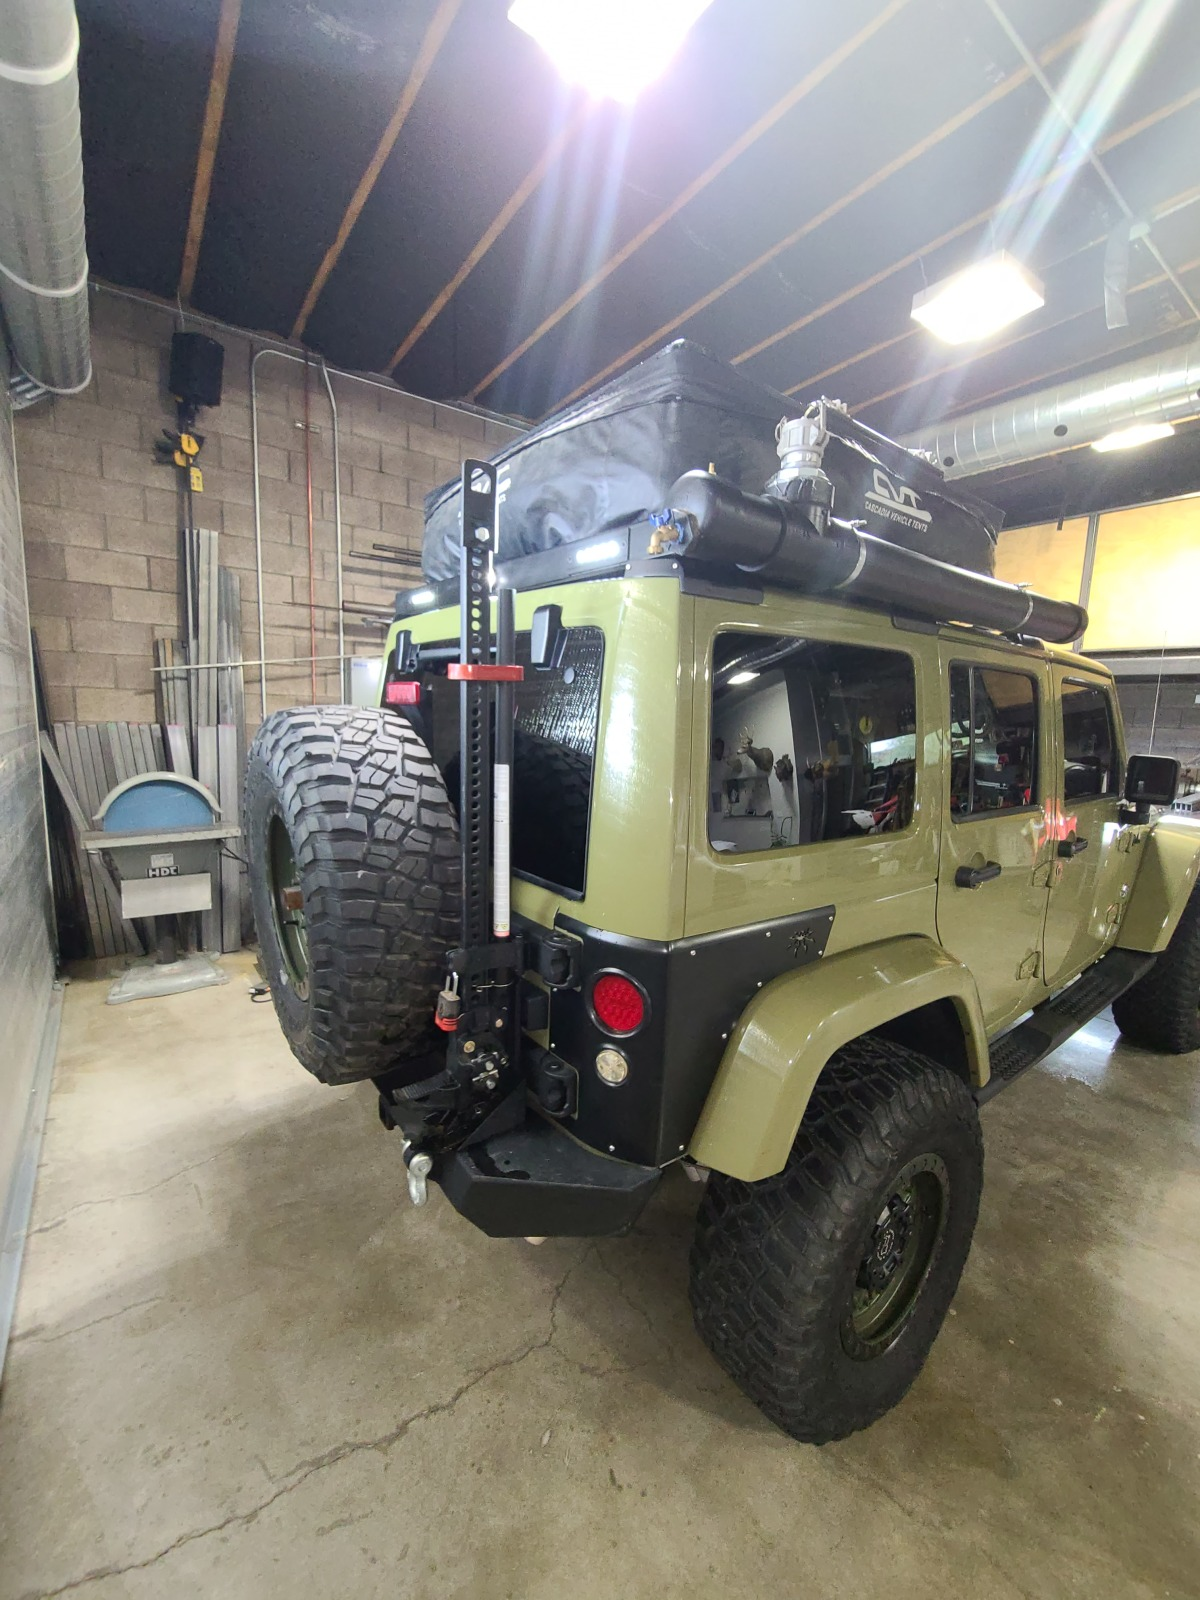 For Sale: 2013 jeep wrangler j/k oscar Mike freedom edition - photo11